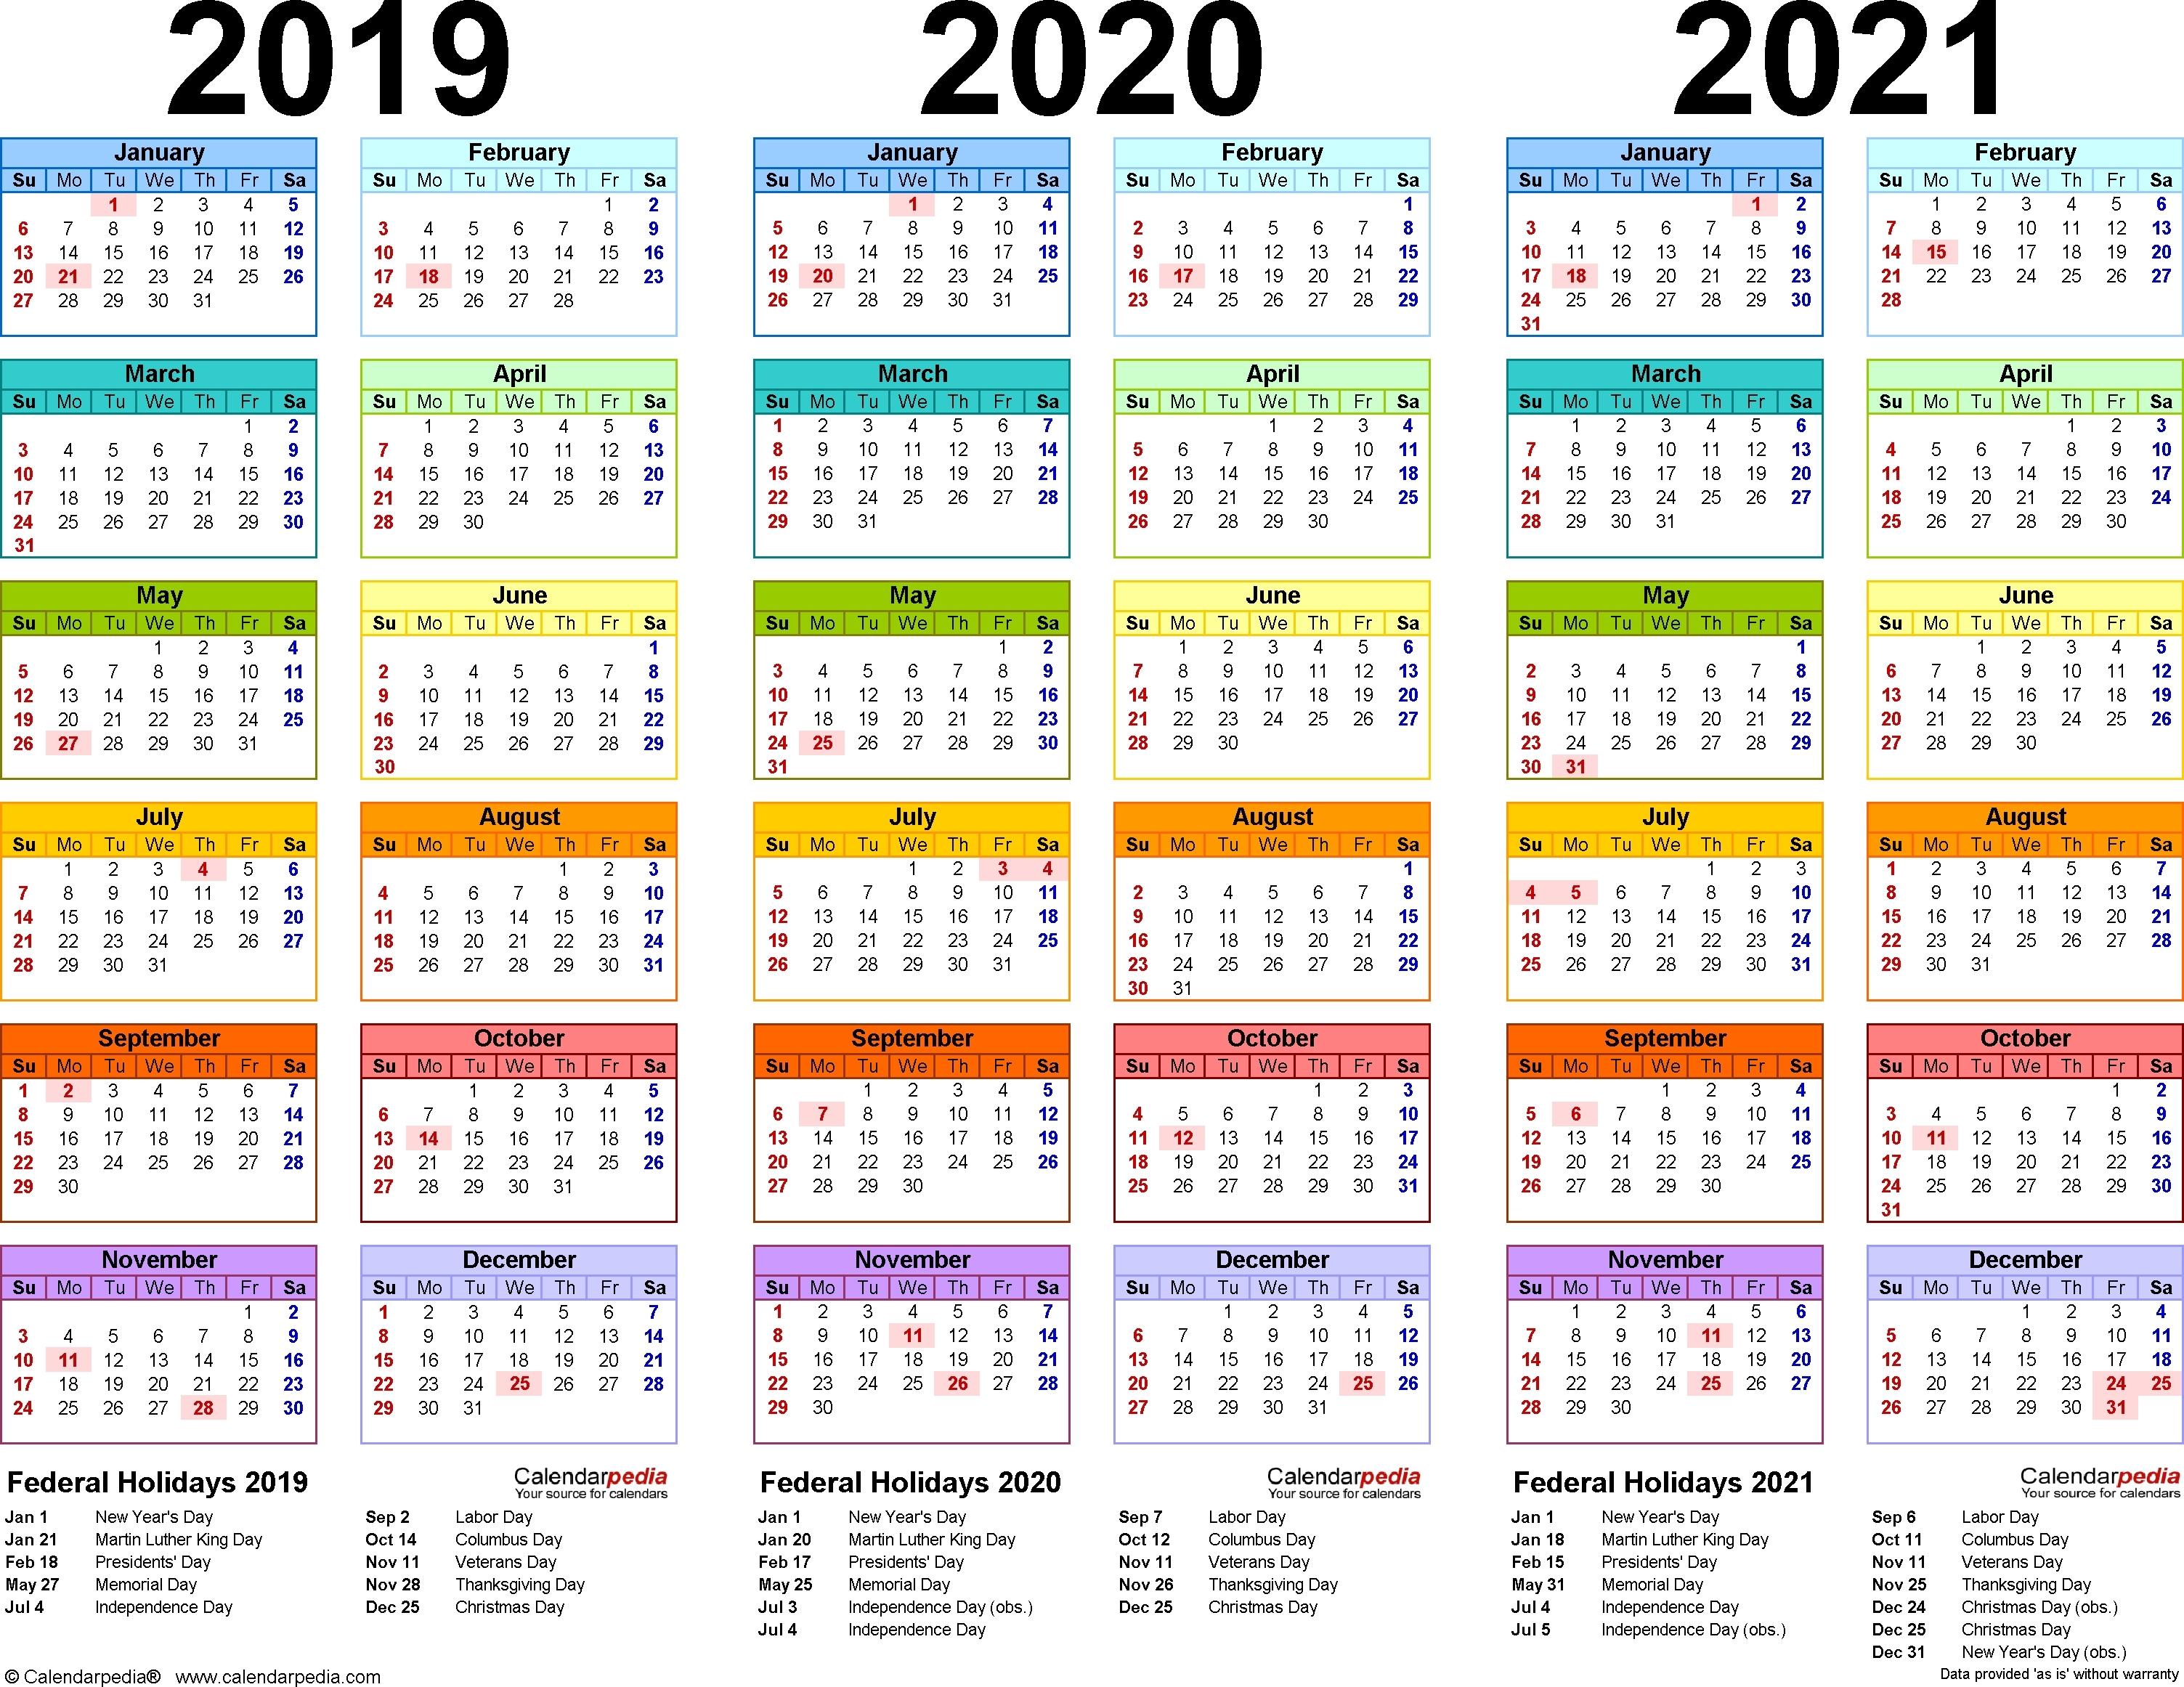 Kalnirnay 2021 Marathi Calendar Pdf Kalnirnay 2020 : Kalnirnay 2020 Marathi   Printable Calendar Kalnirnay September 2021 Marathi Calendar Pdf